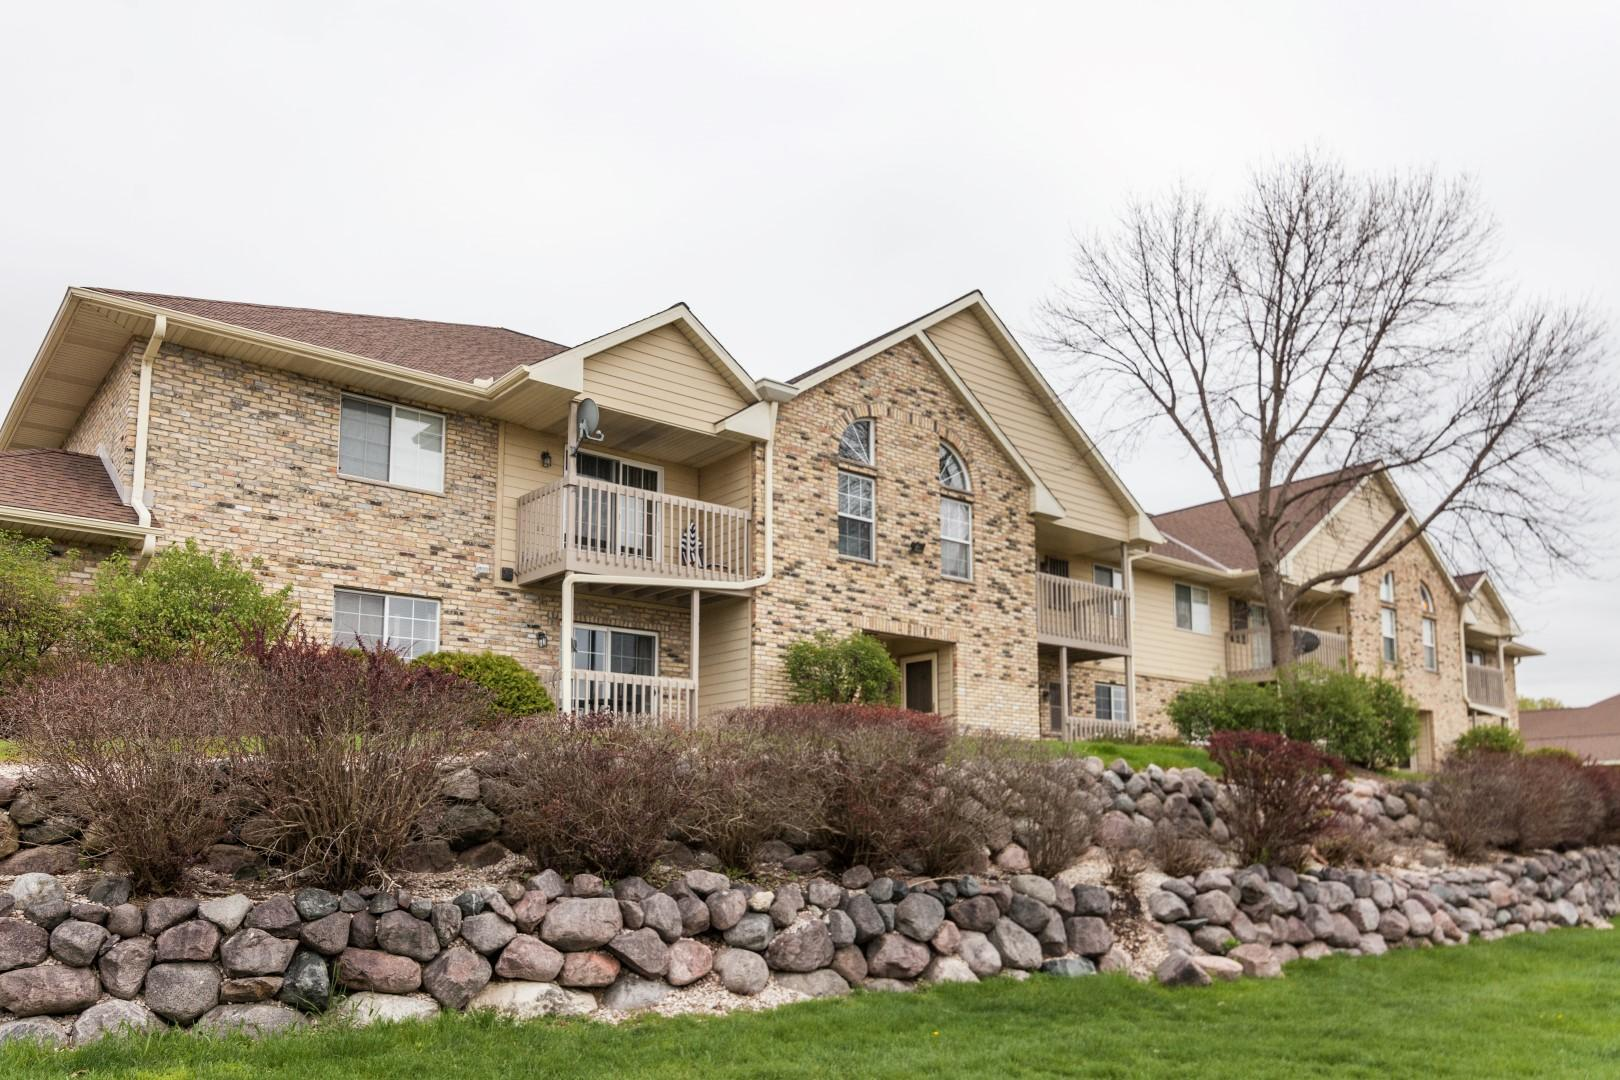 4875 Easy St, Delafield, Wisconsin 53029, 2 Bedrooms Bedrooms, ,1 BathroomBathrooms,Condominiums,For Sale,Easy St,1,1637759